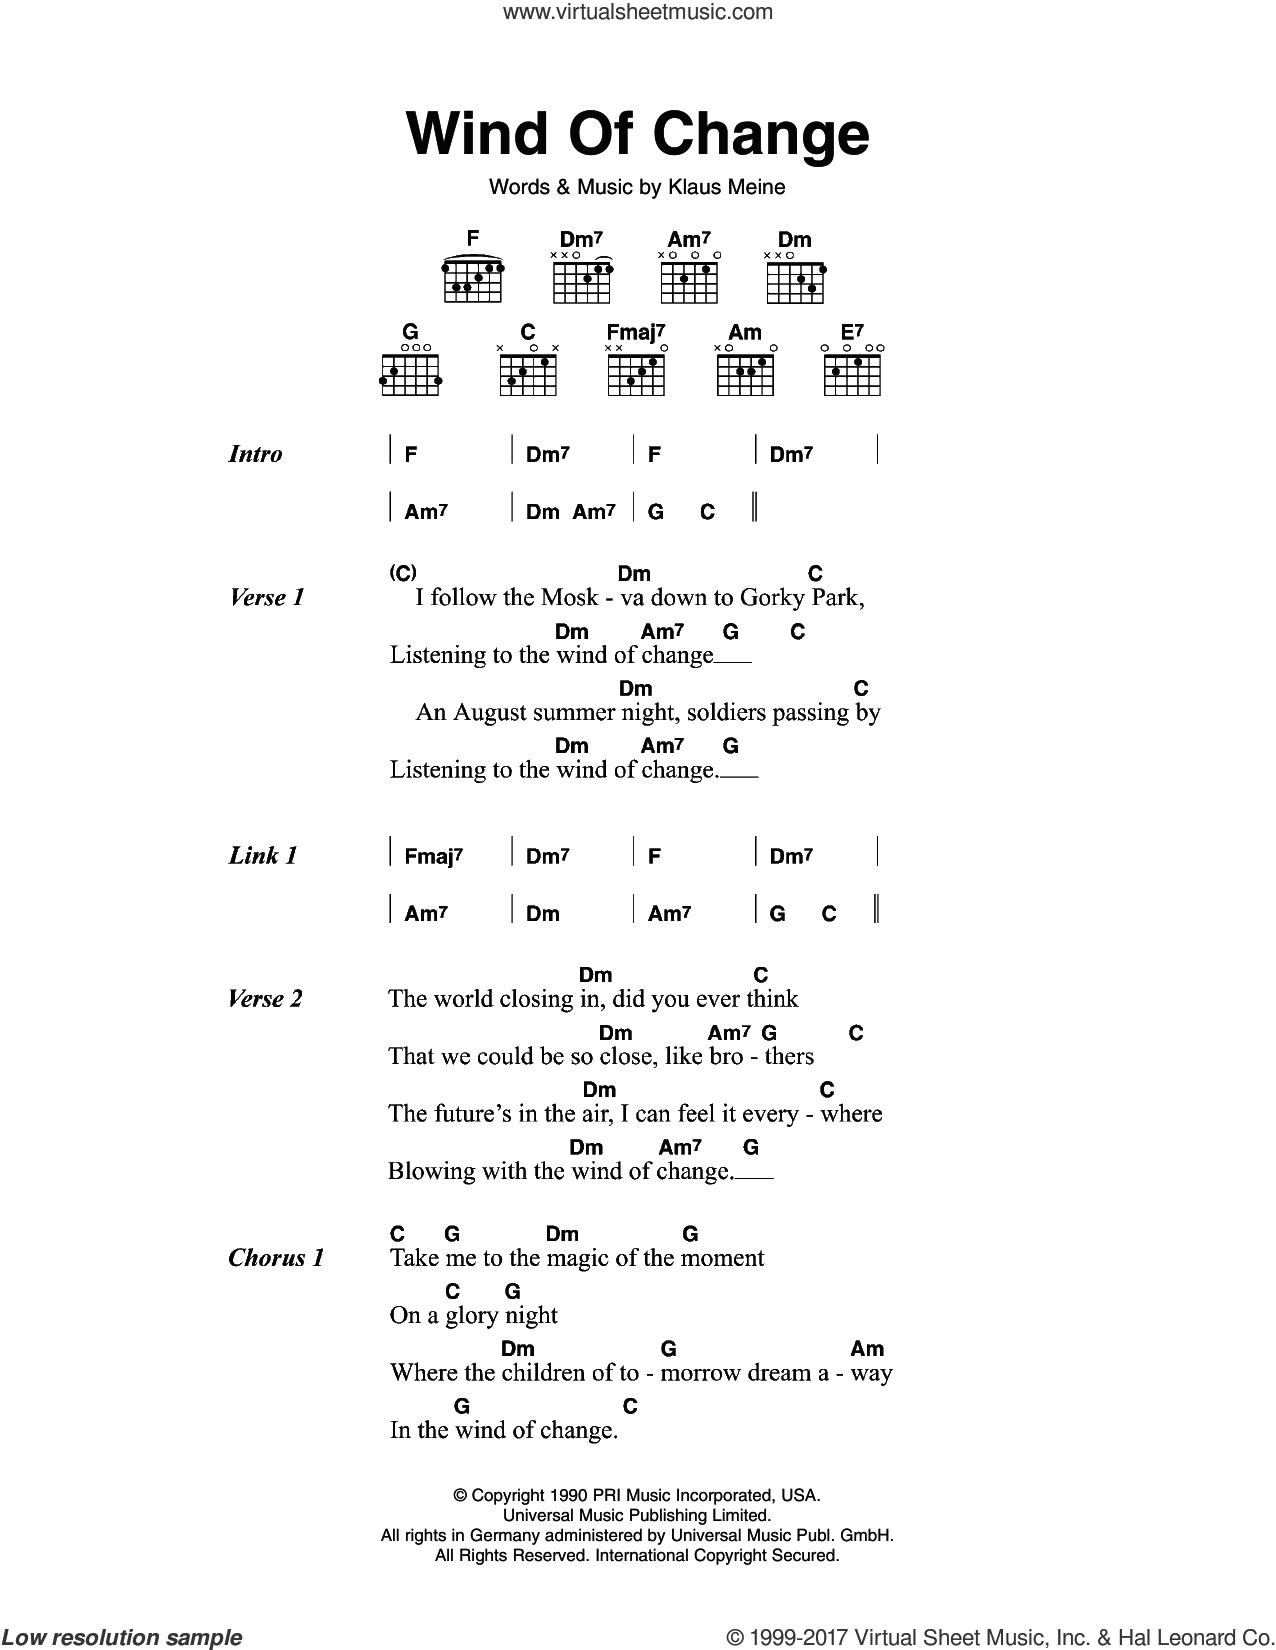 Scorpions – Wind Of Change sheet music for guitar (chords) [PDF] – Michael Ashton